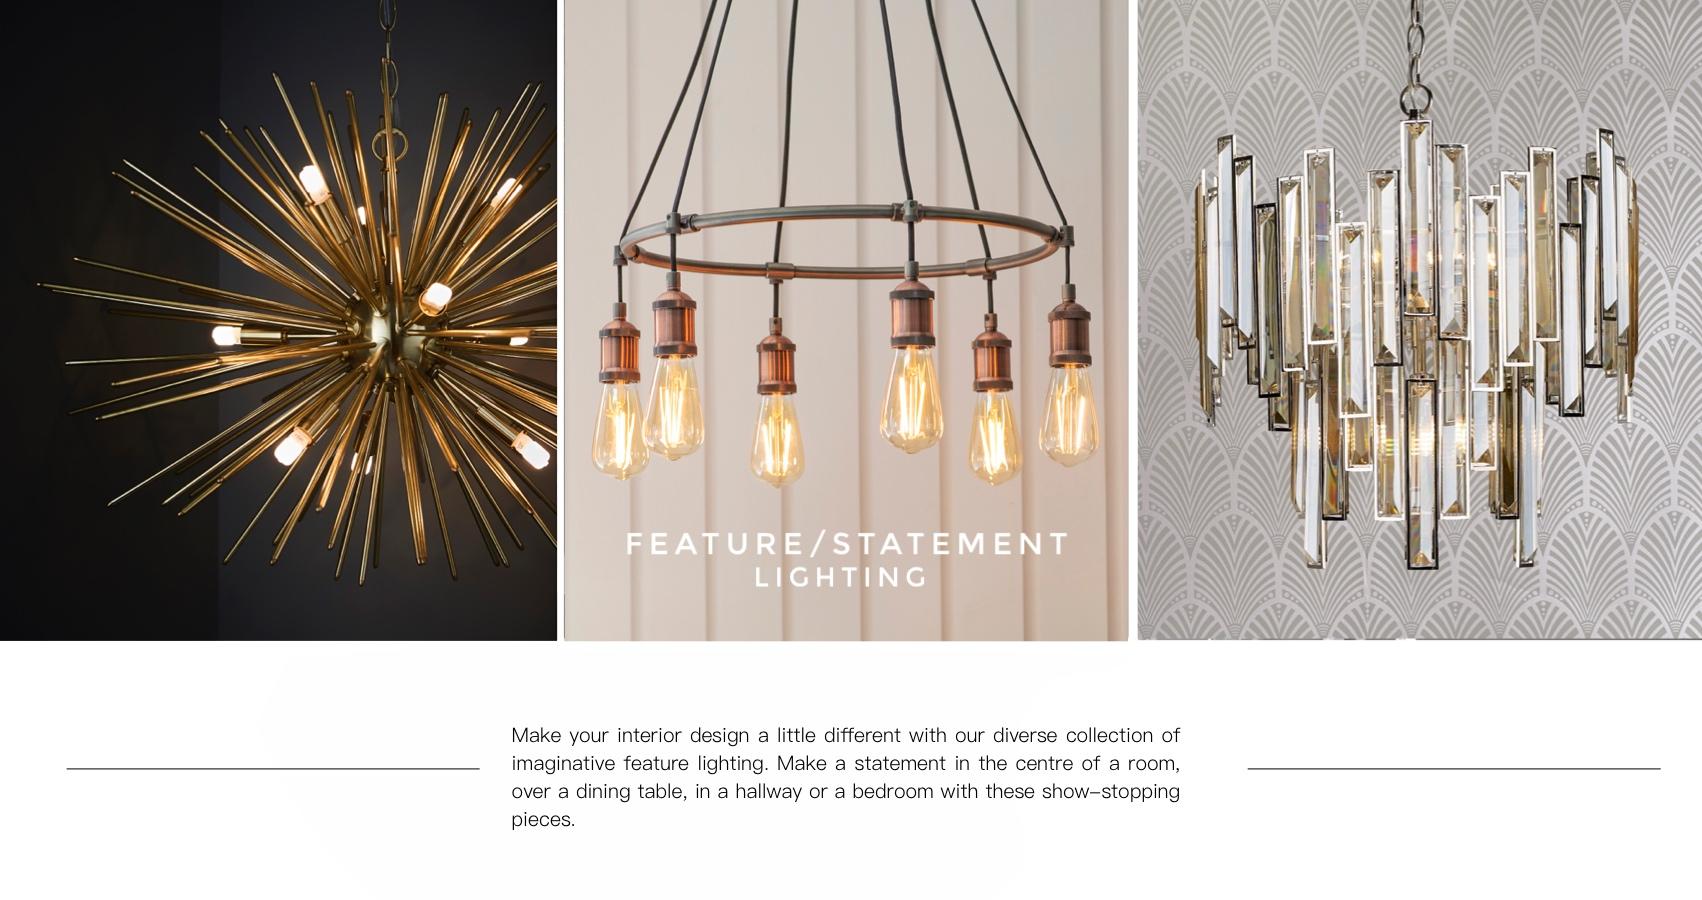 Feature Lighting Lightbox